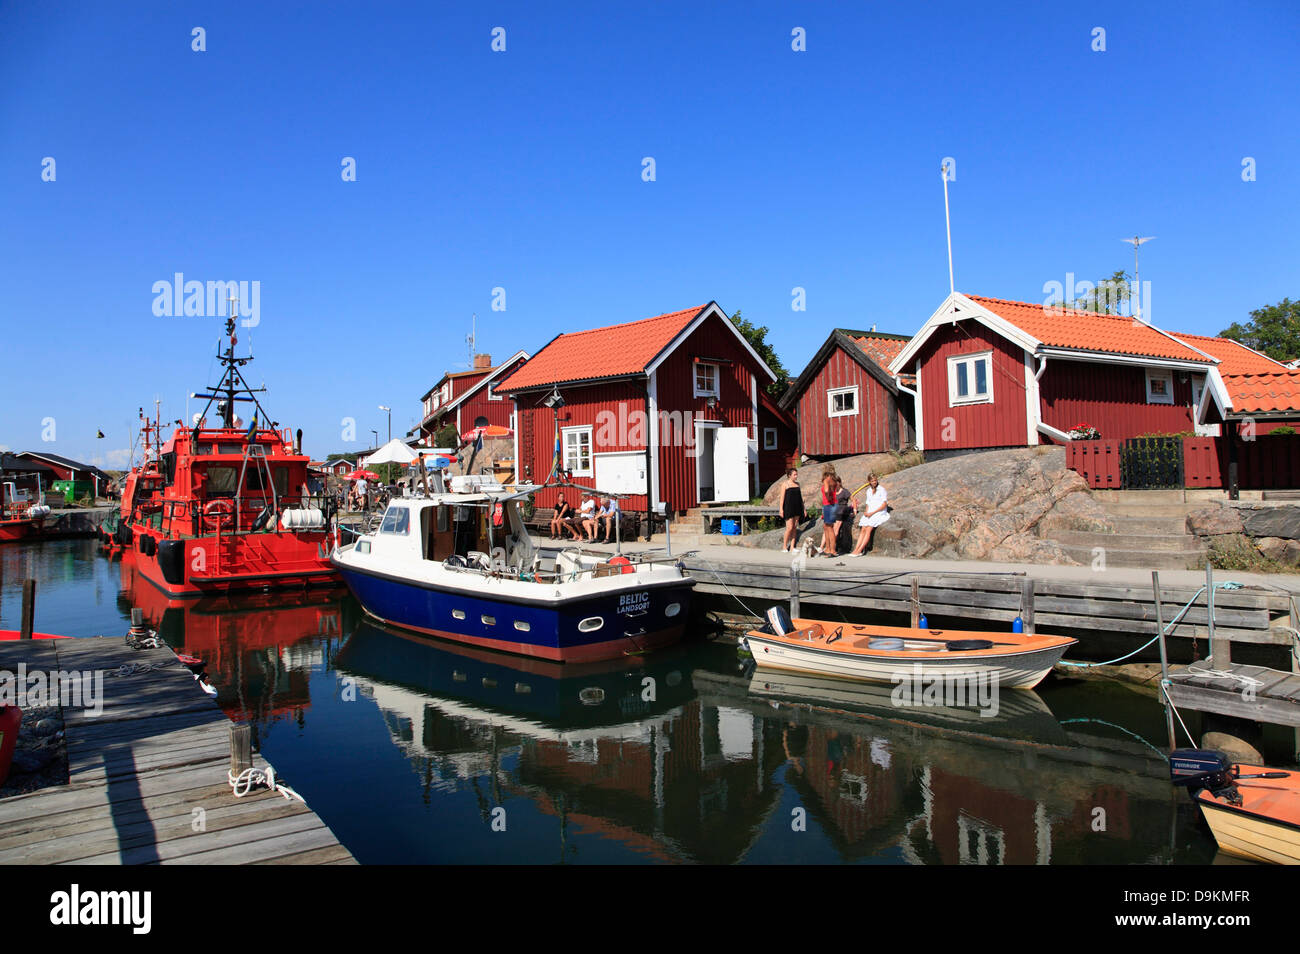 Pilot boat in the harbor of Landsort Island (Oeja), harbor, Stockholm Archipelago, baltic sea coast, Sweden, Scandinavia - Stock Image